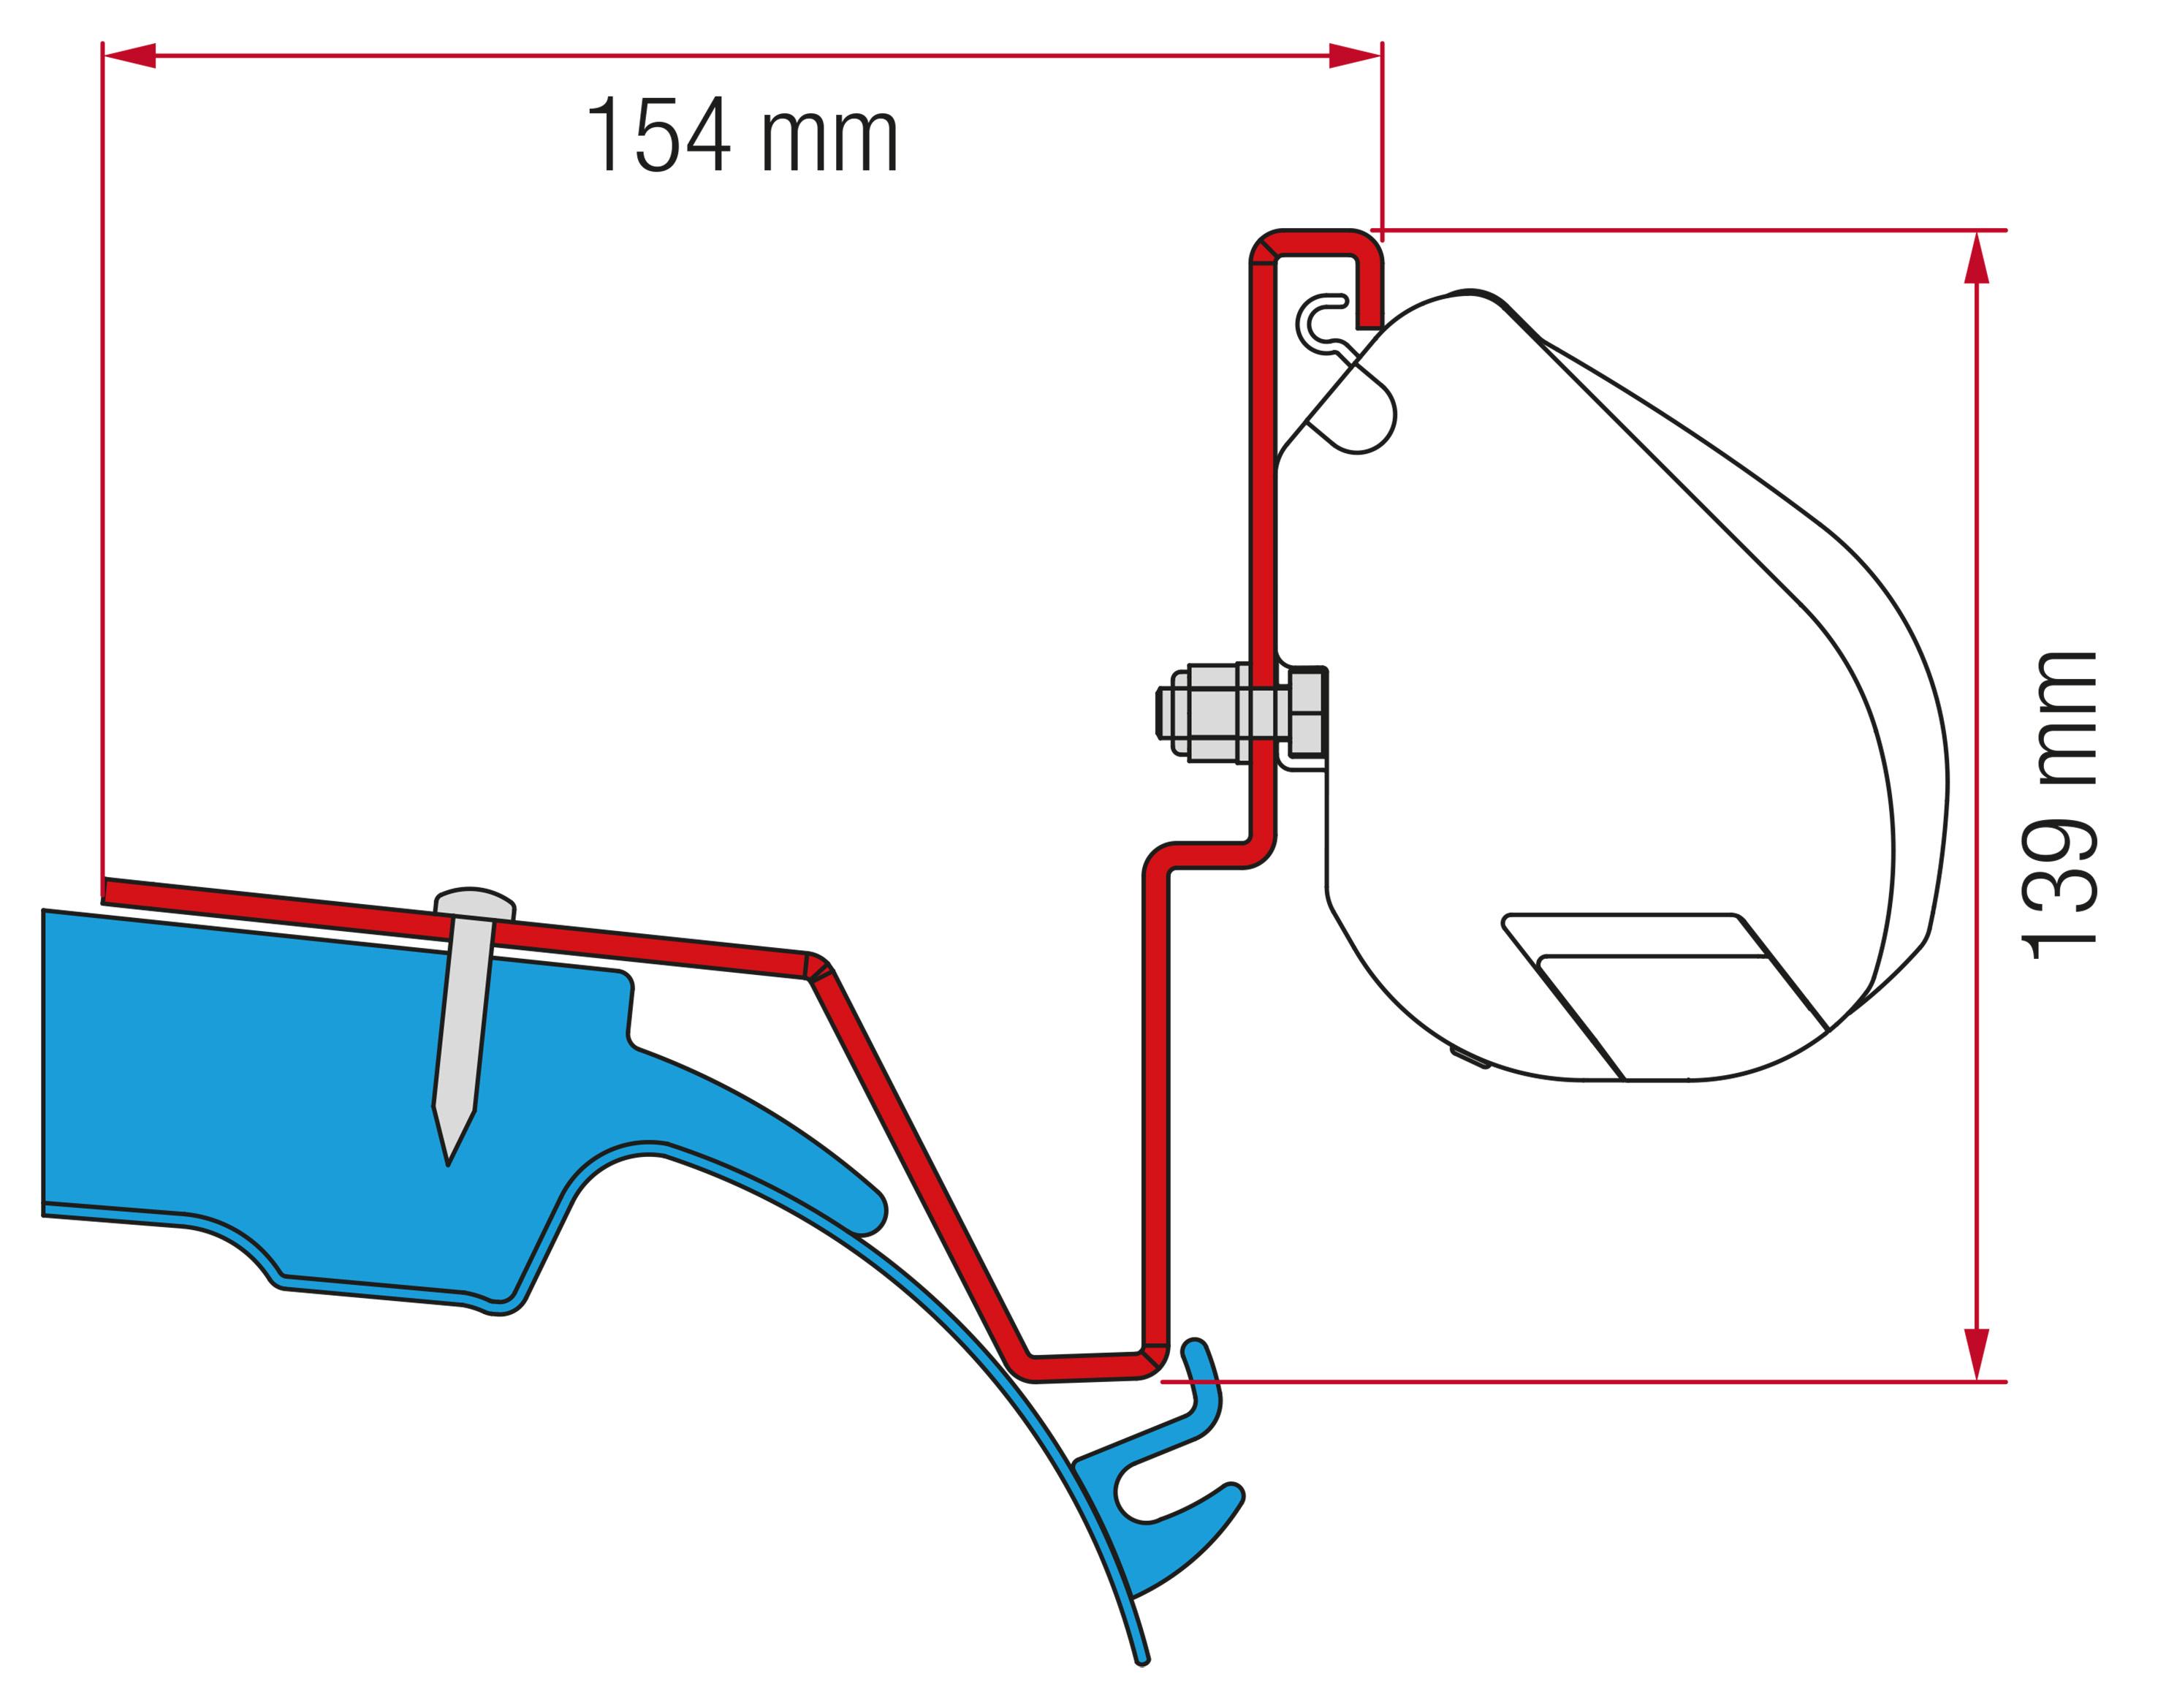 fiamma adapter f35 kit mercedes vito jules verne 98655z034. Black Bedroom Furniture Sets. Home Design Ideas